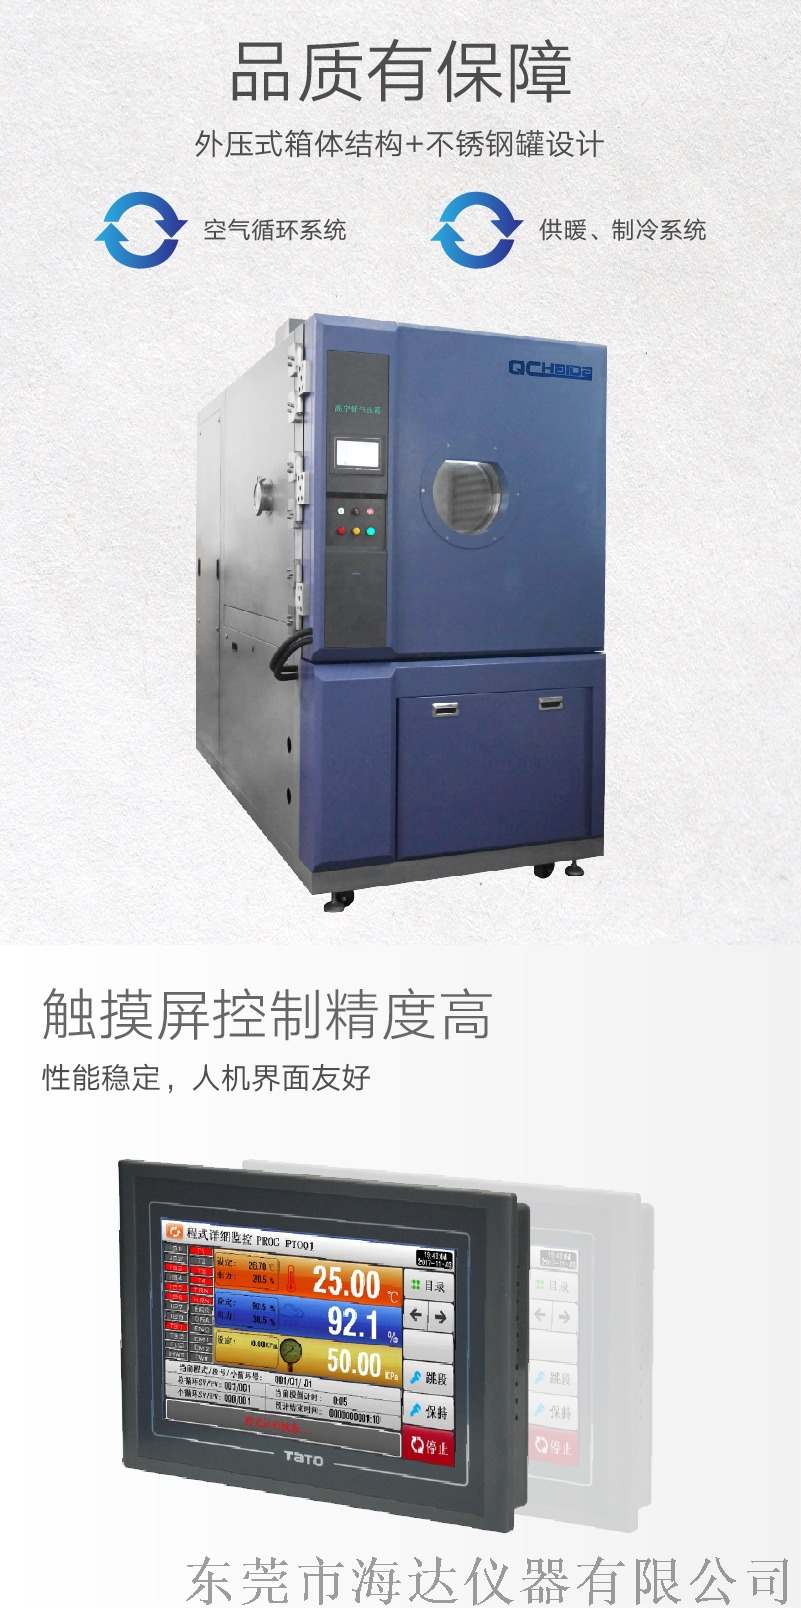 HD-E714高空低气压试验机 (3).jpg